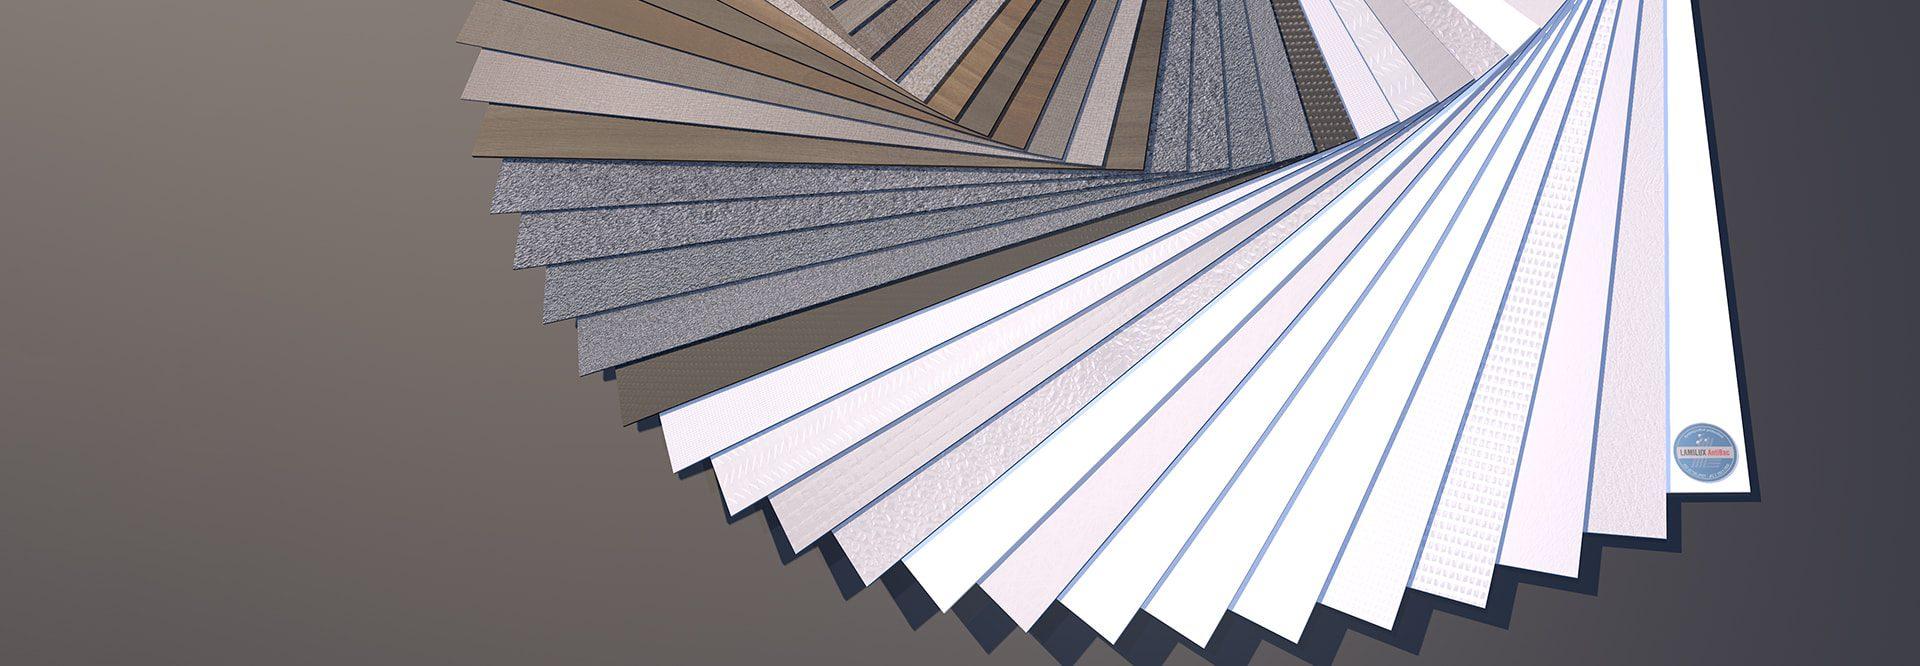 materialy_kompozytowe_budowlane_LAMILUX